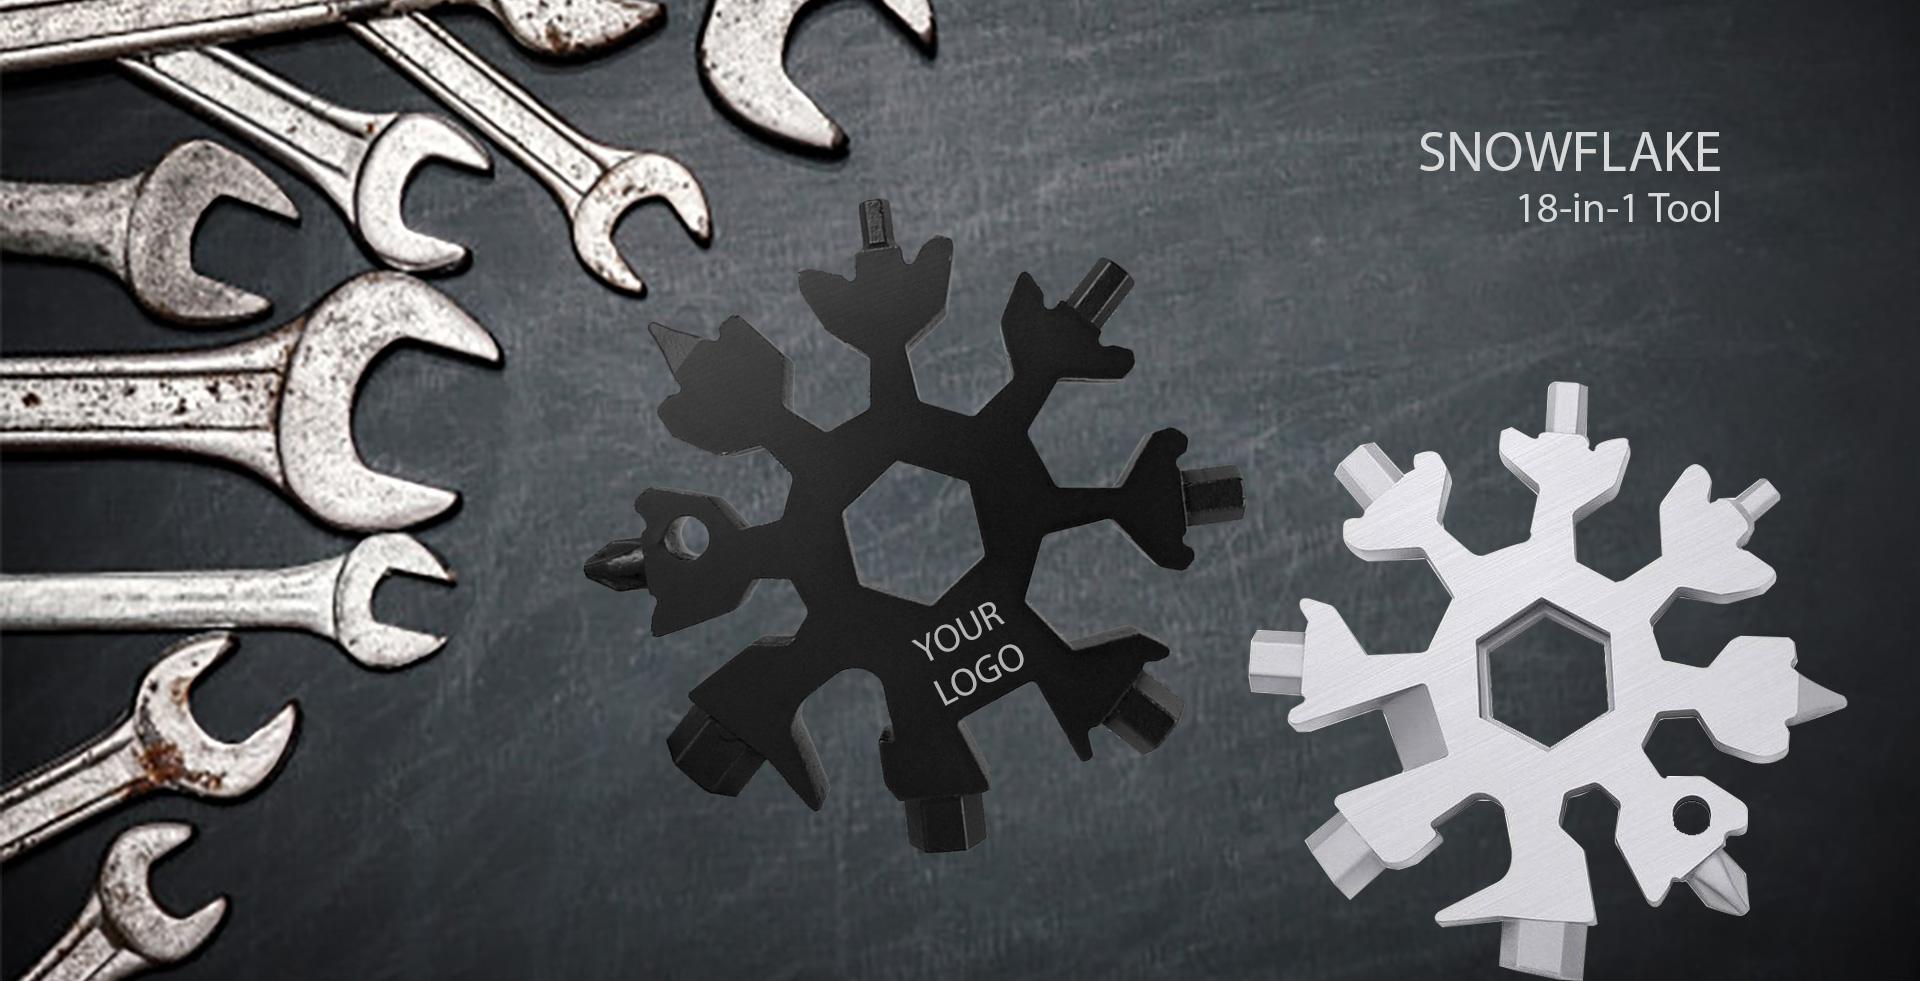 Snowflake 18-in-1 Multi Tool